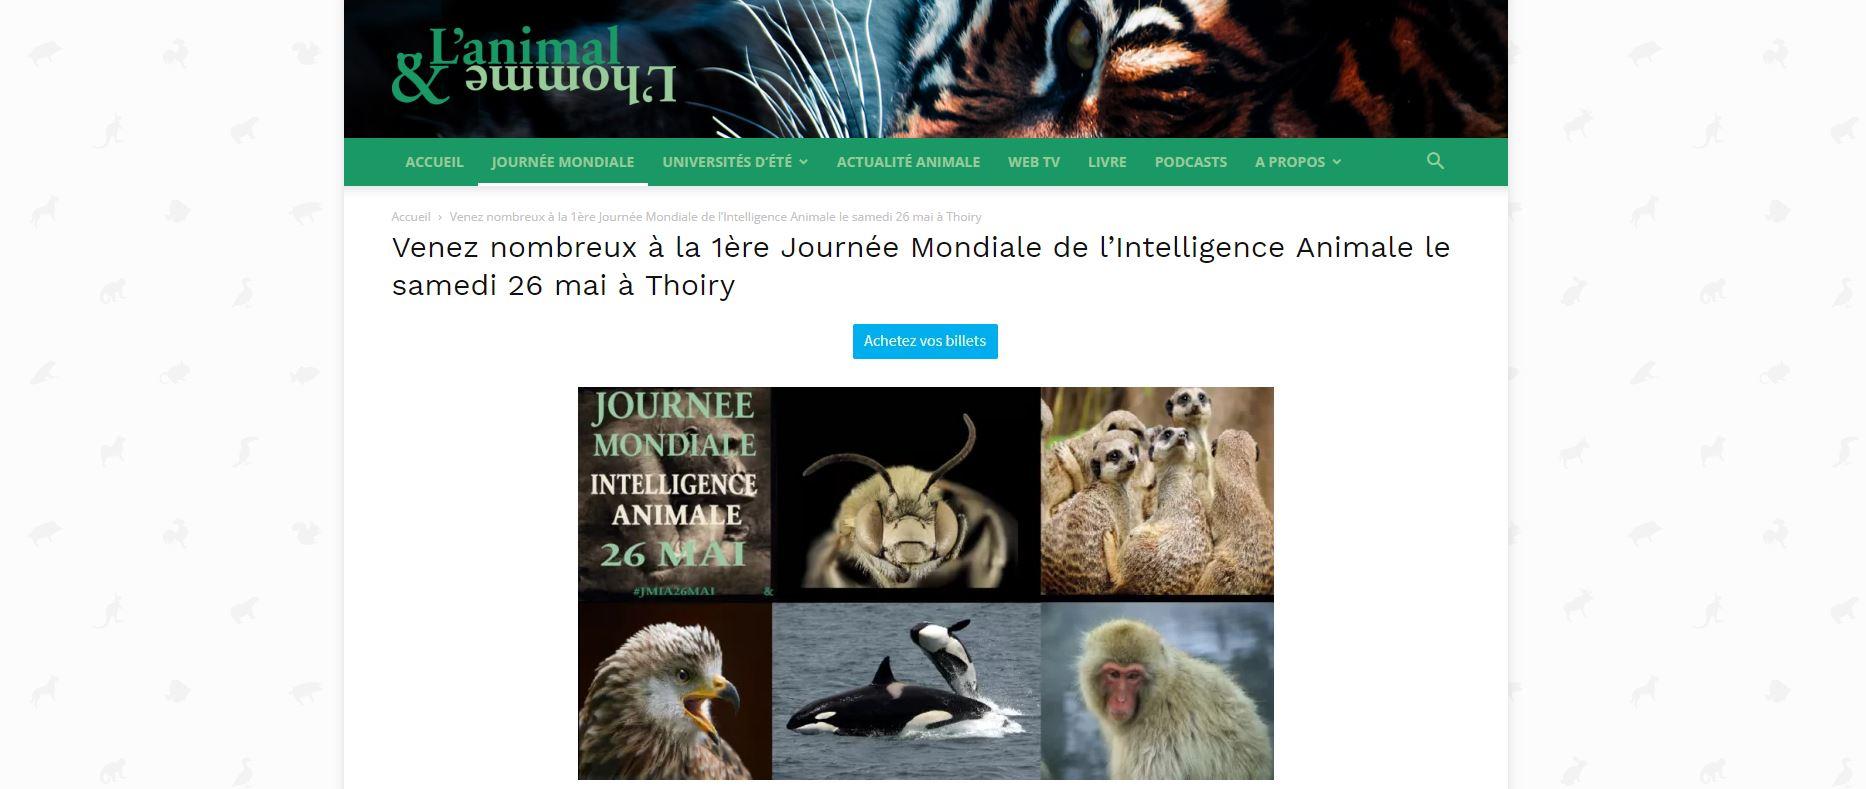 SAMEDI 26 MAI : 1ère Journée Mondiale de l'Intelligence Animale à Thoiry